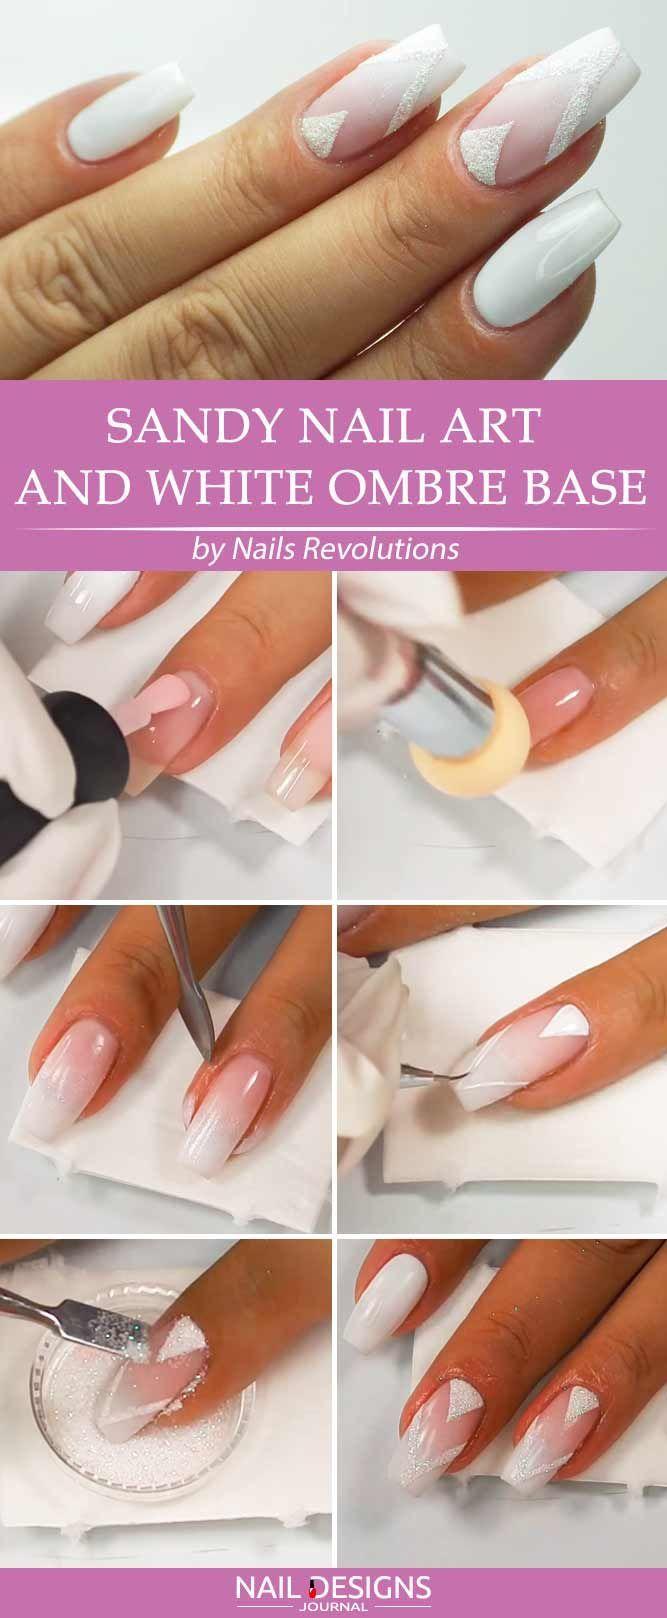 Super Easy Aeropuffing Nail Art Tutorials To Do At Home White